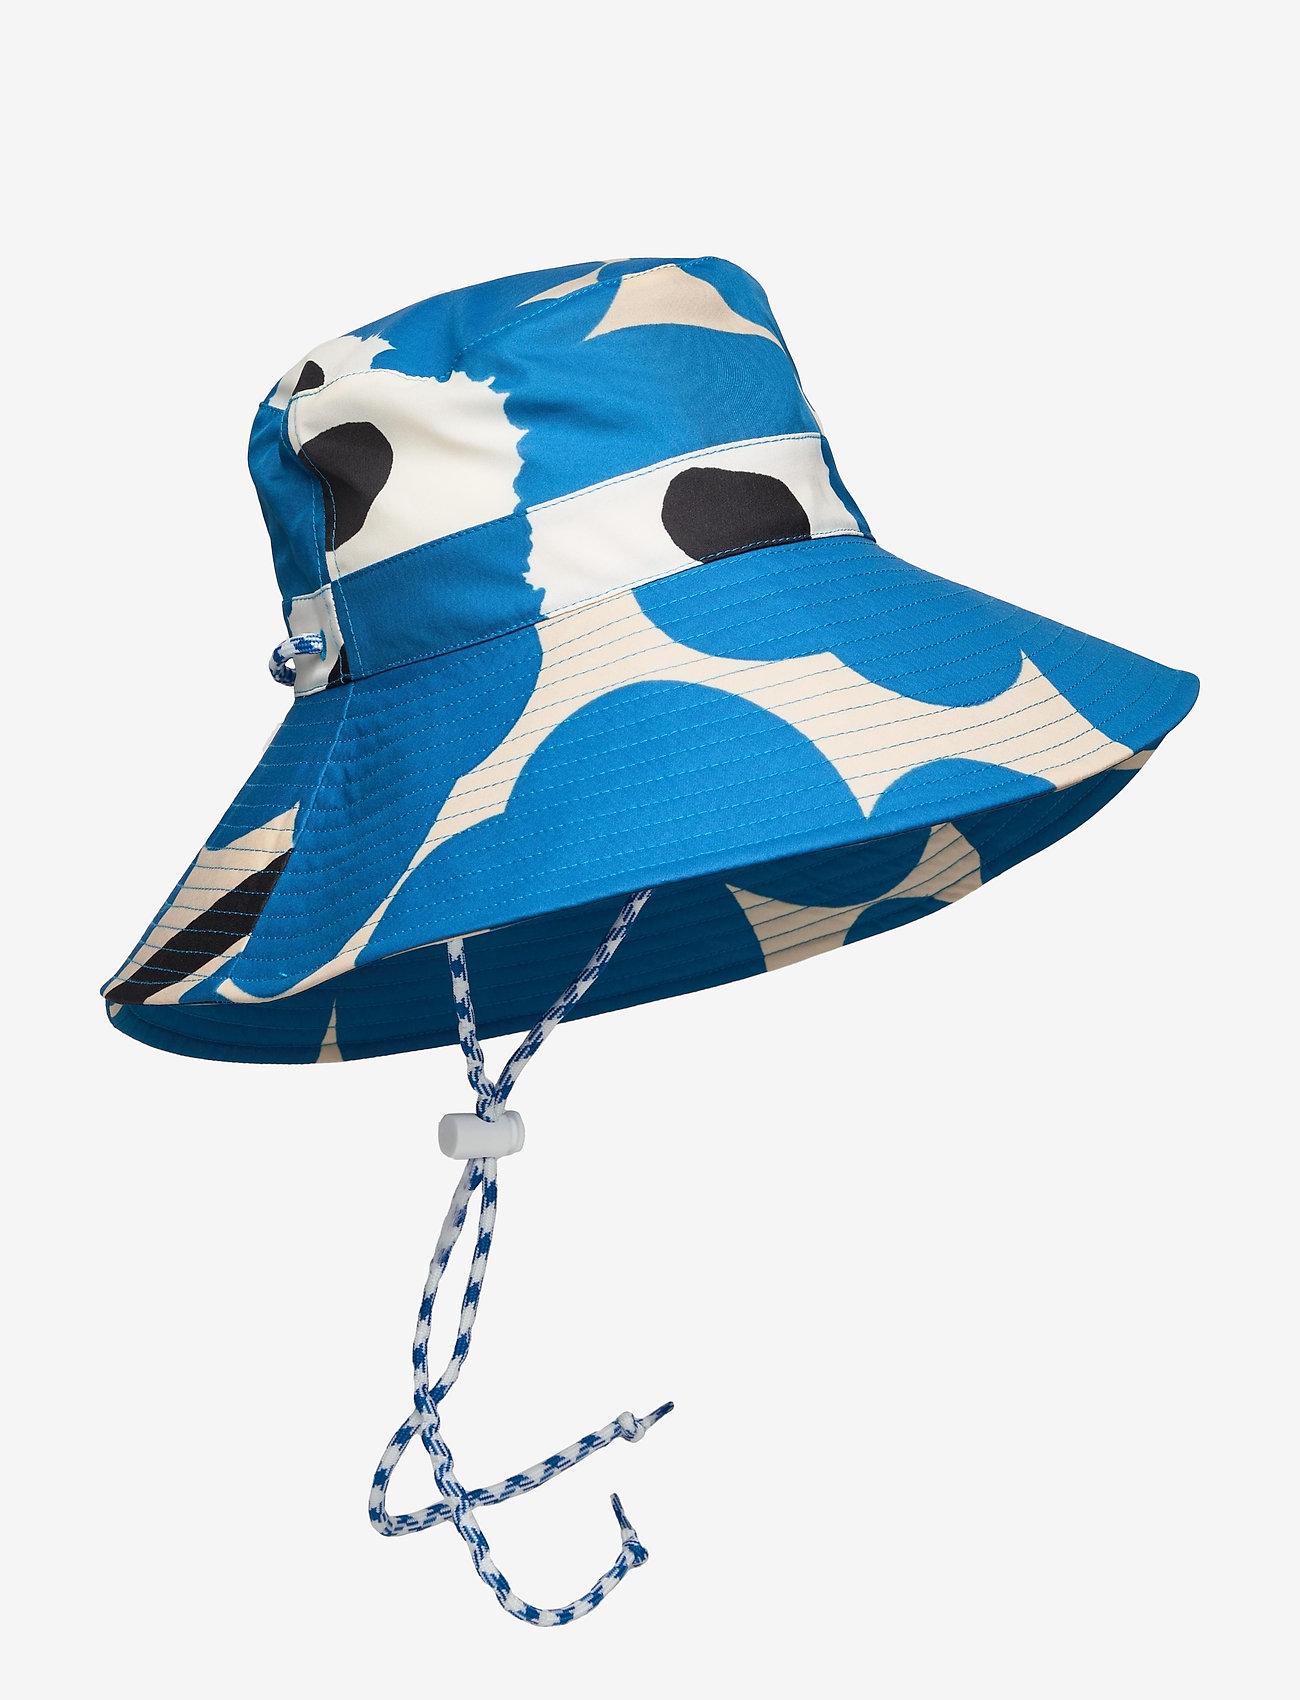 Marimekko - SIIMEKSESSÄ UNIKKO RAIN HAT - bøllehatte - beige, blue, black - 0